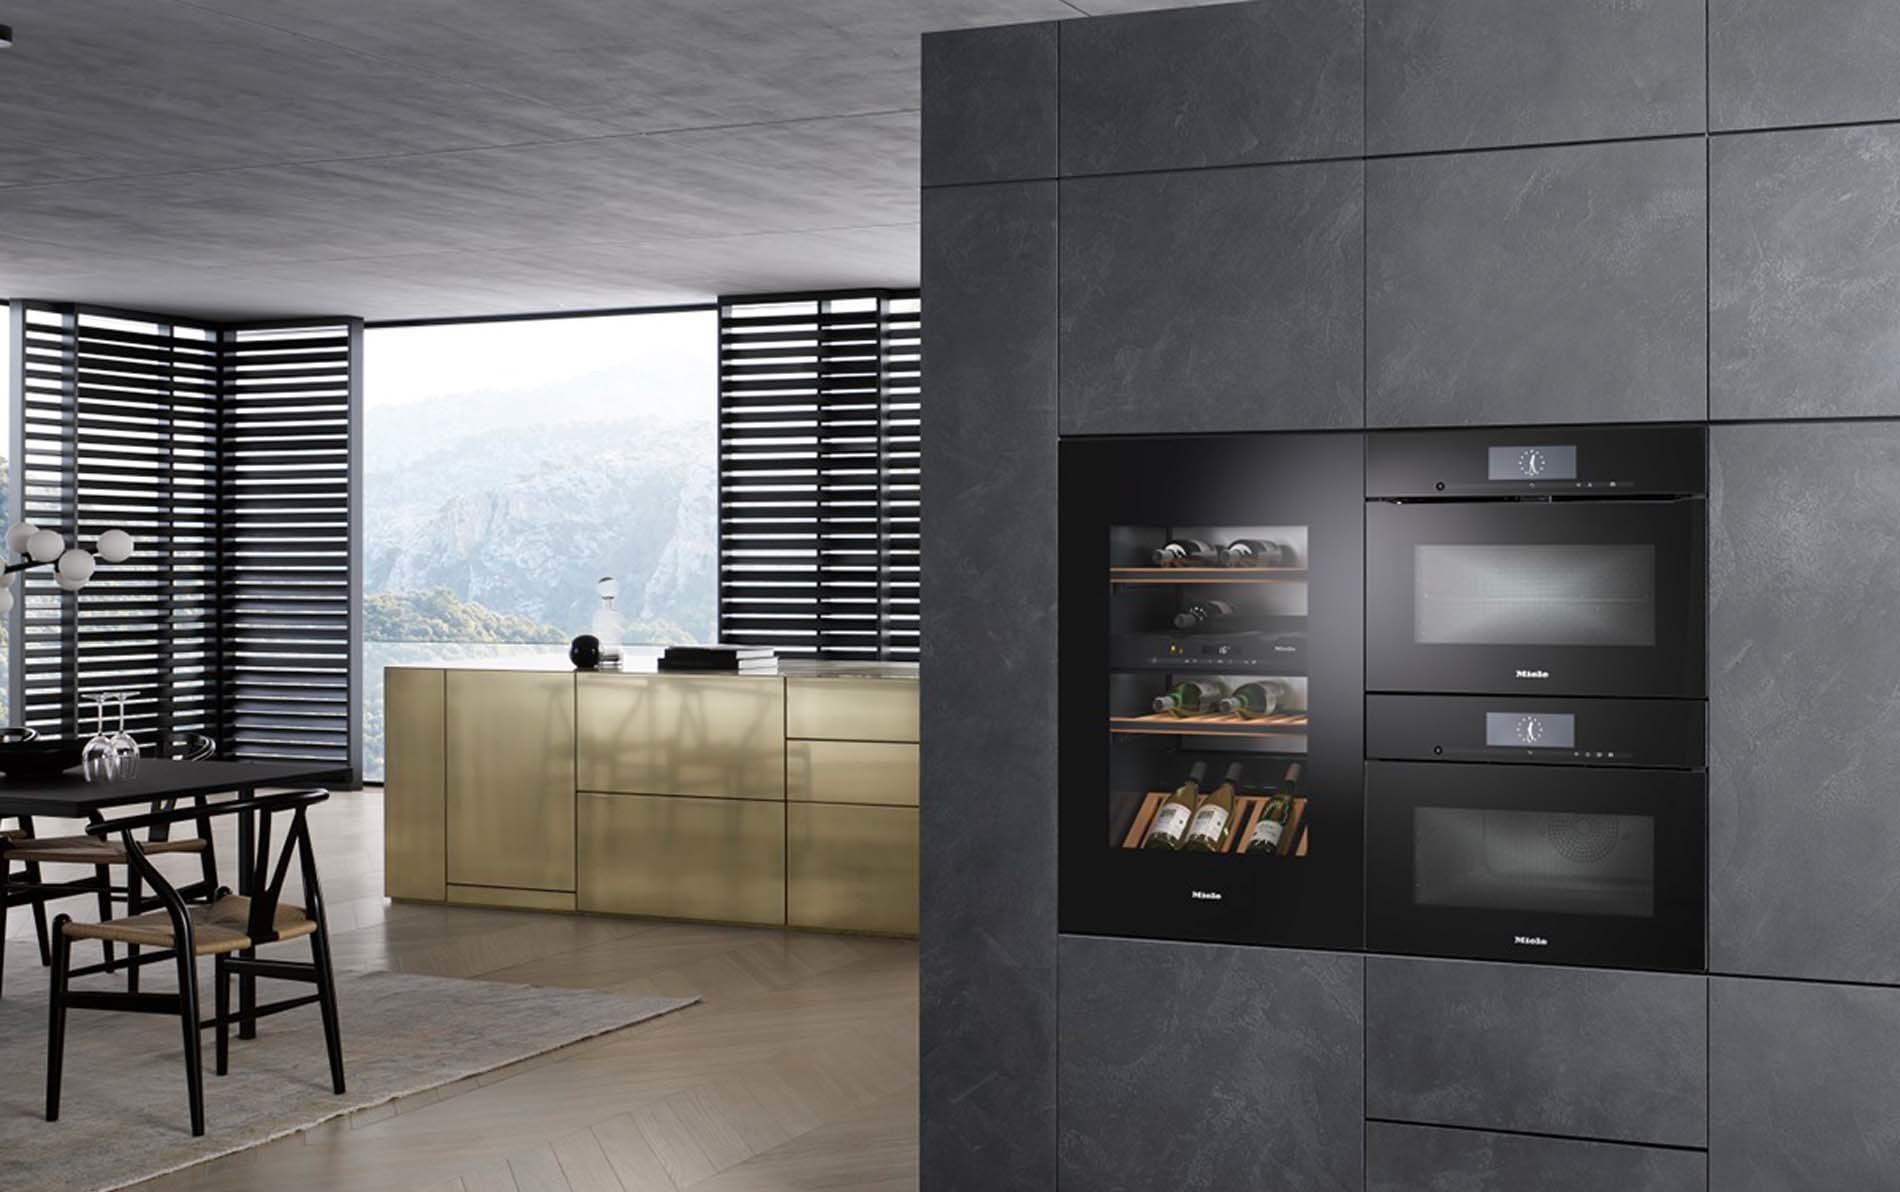 Keukenapparatuur Miele wijnklimaatkast met ovens, ASWA Keukens